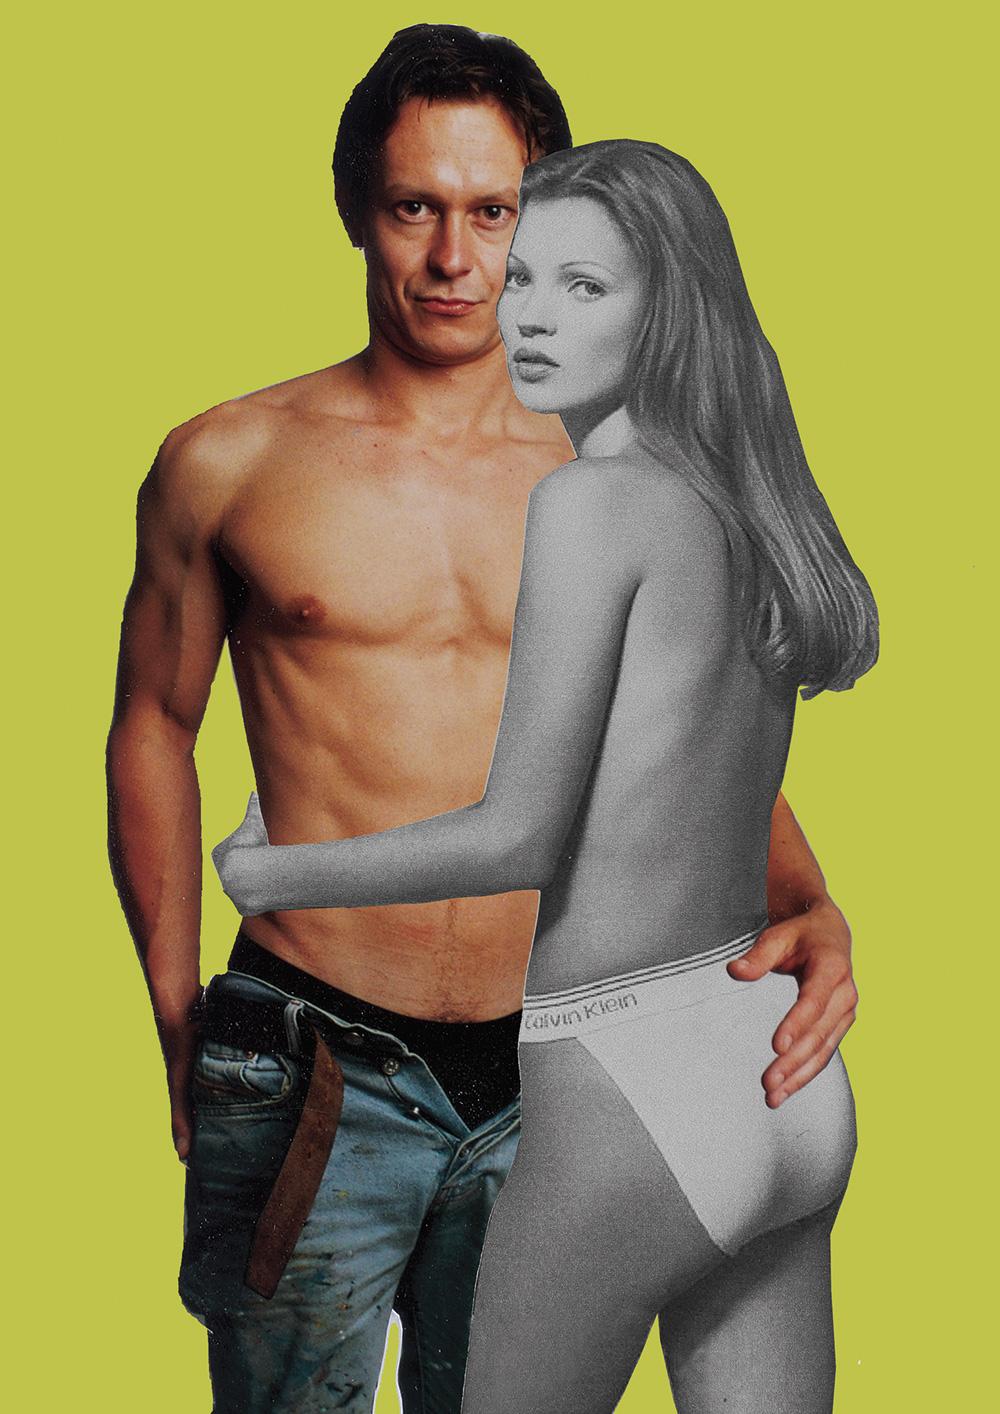 Kate Moss Maler und Modell 1